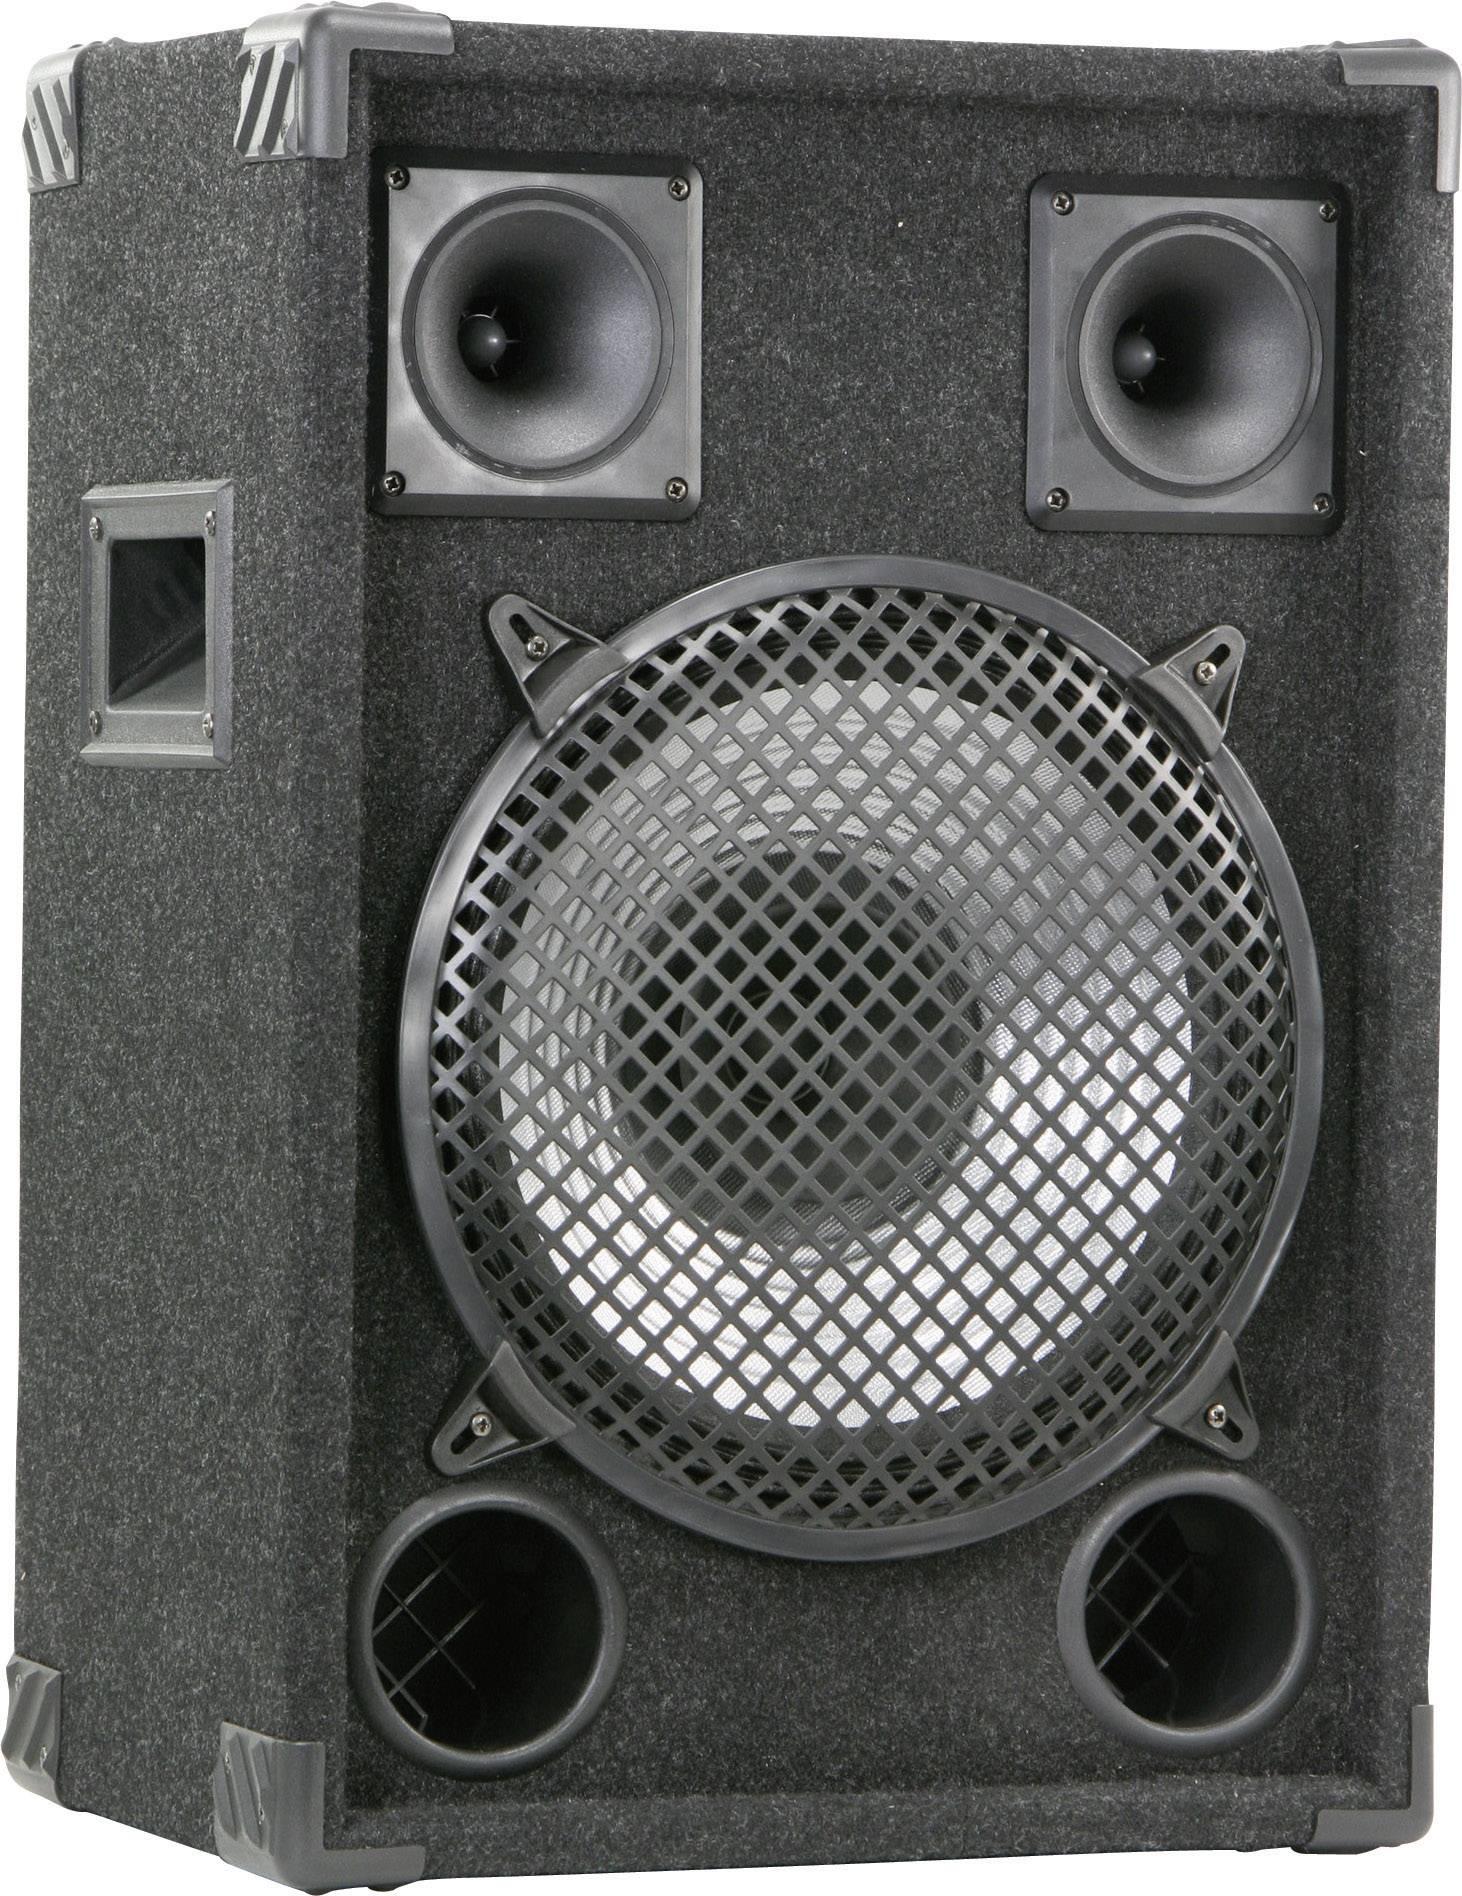 PA reproduktor 1202, 4 ohm, 93dB, 150/400 W